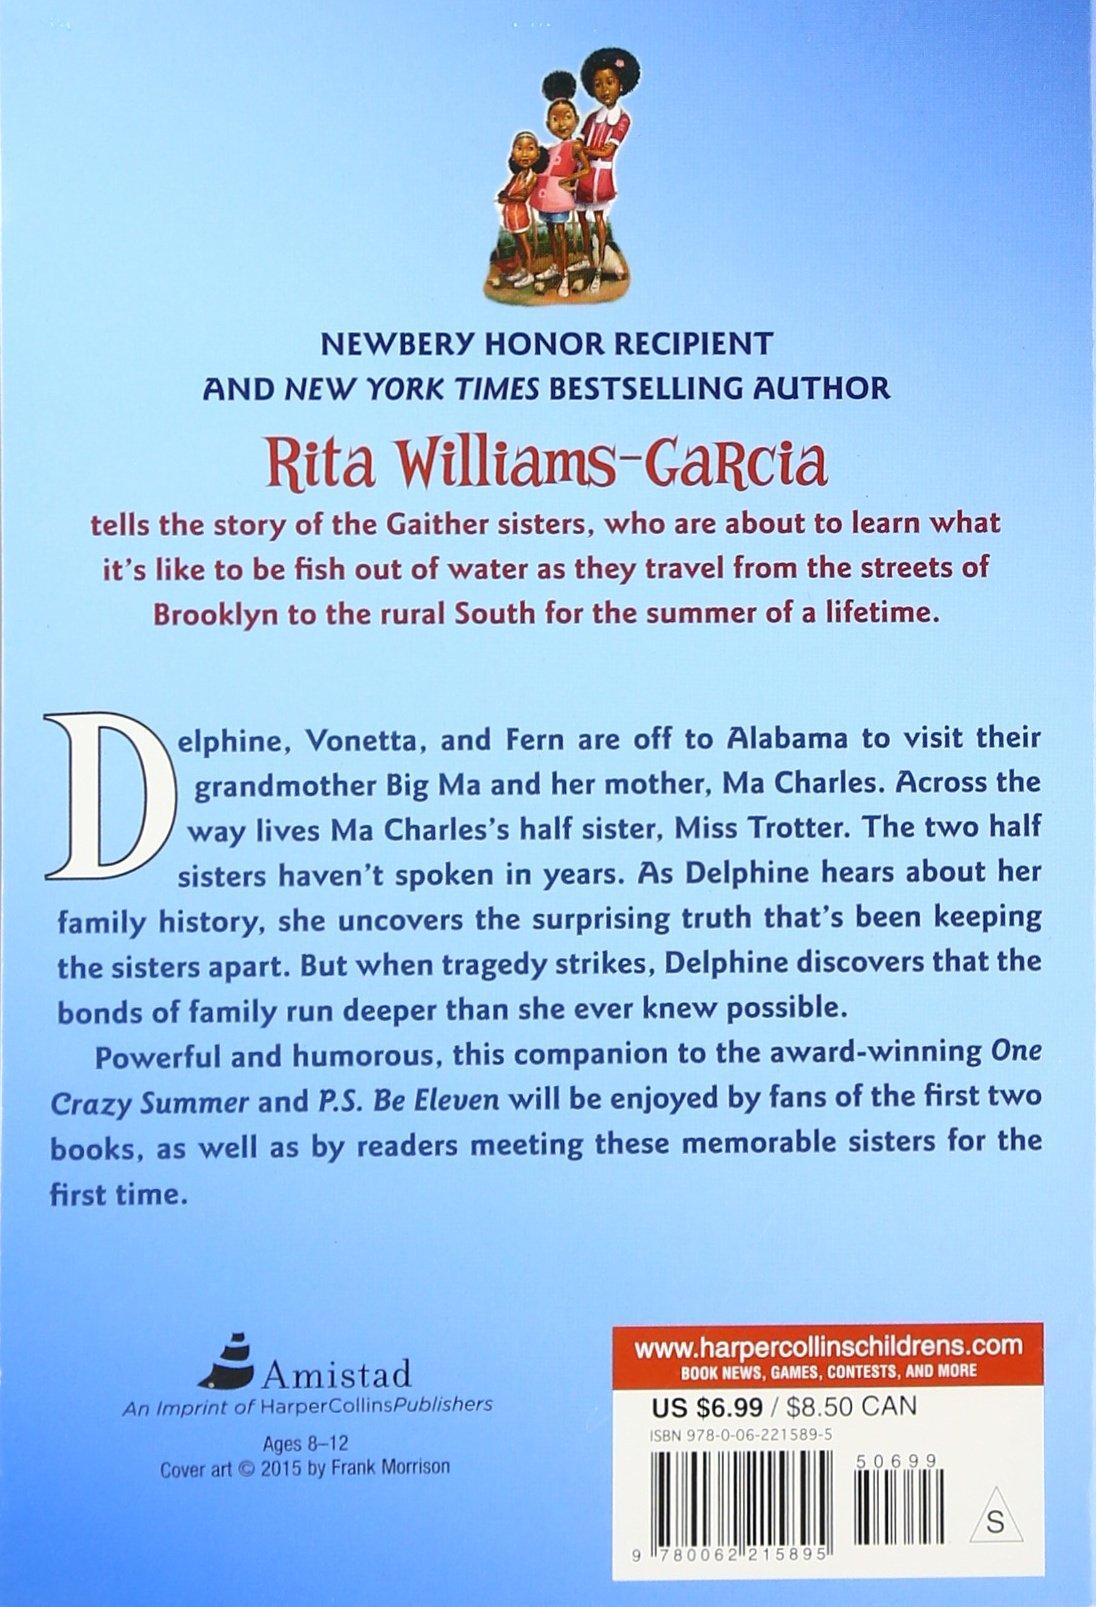 Gone Crazy In Alabama: Rita Williamsgarcia: 9780062215895: Amazon:  Books